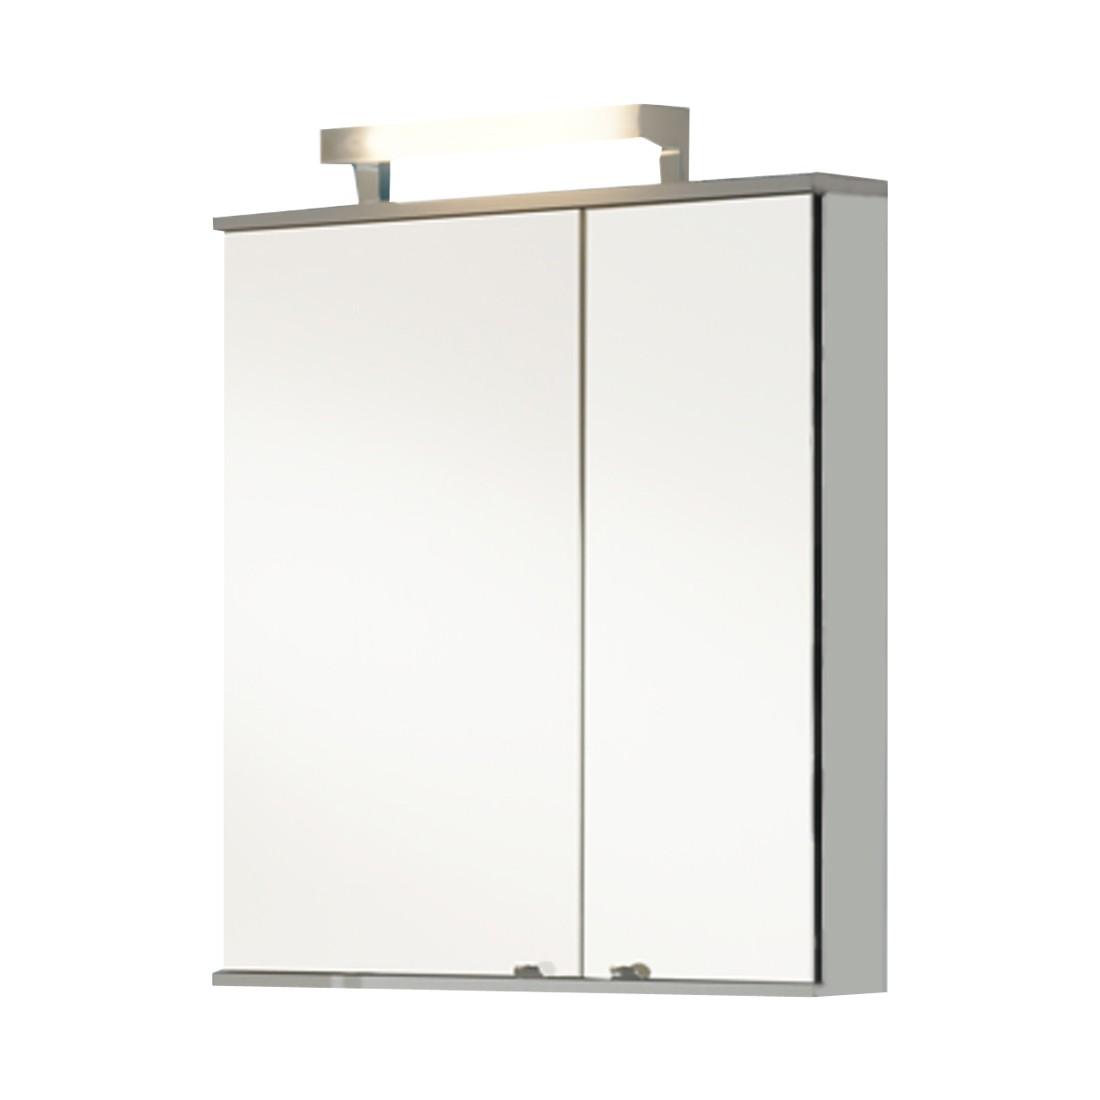 energie  A+, Spiegelkast Treviso - aluminiumkleurig, Kesper Badmöbel